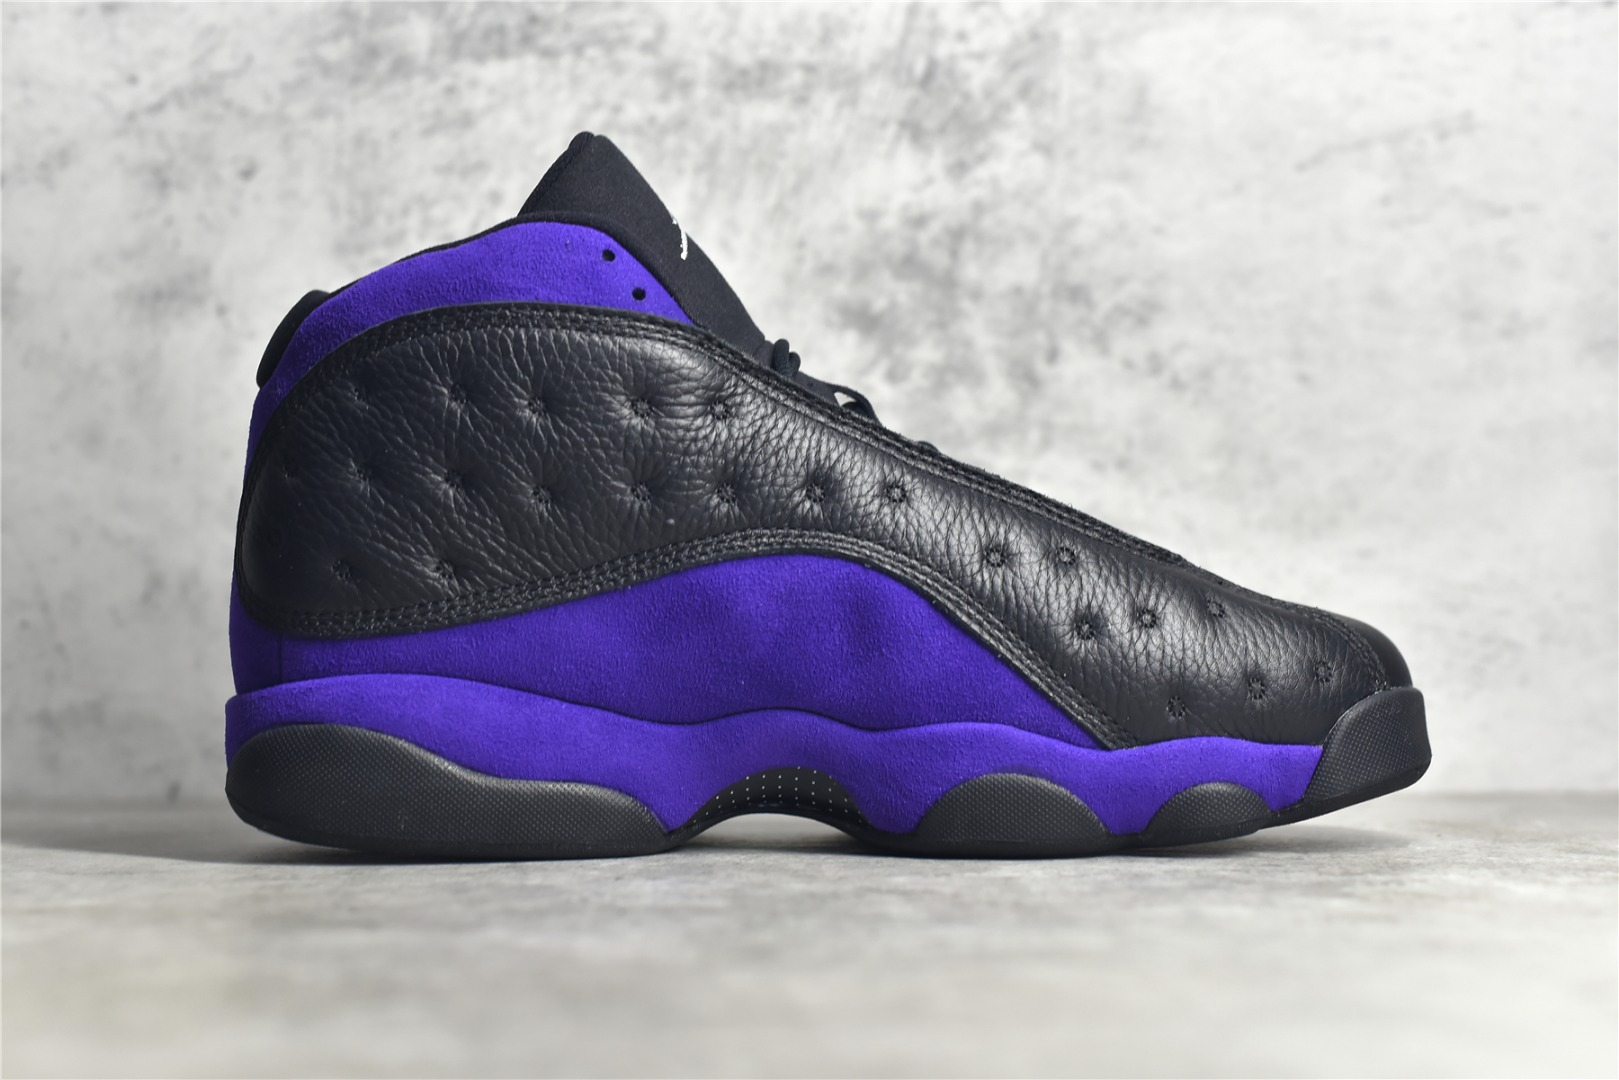 "PK纯原版本AJ13黑紫 Air Jordan 13 Retro ""Court Purple"" AJ13真猫眼 AJ13原厂真碳纤维缓震球鞋 货号:DJ5982-015-潮流者之家"